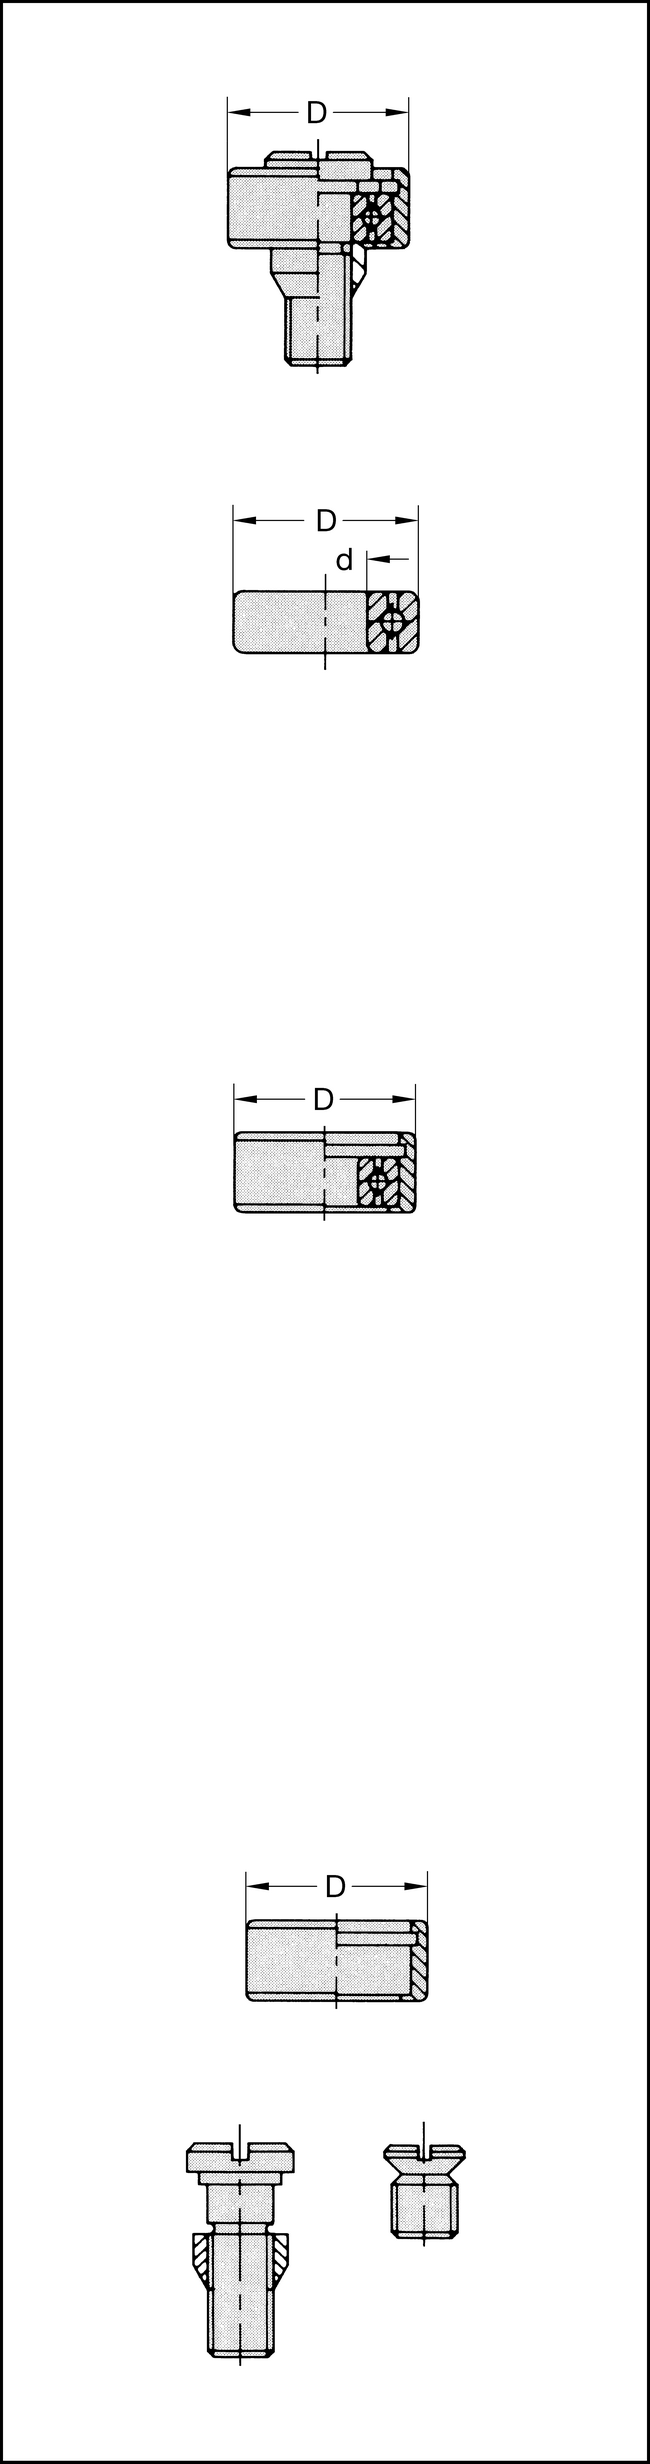 Kugellager 12,7x4,76mm d=6,35mm